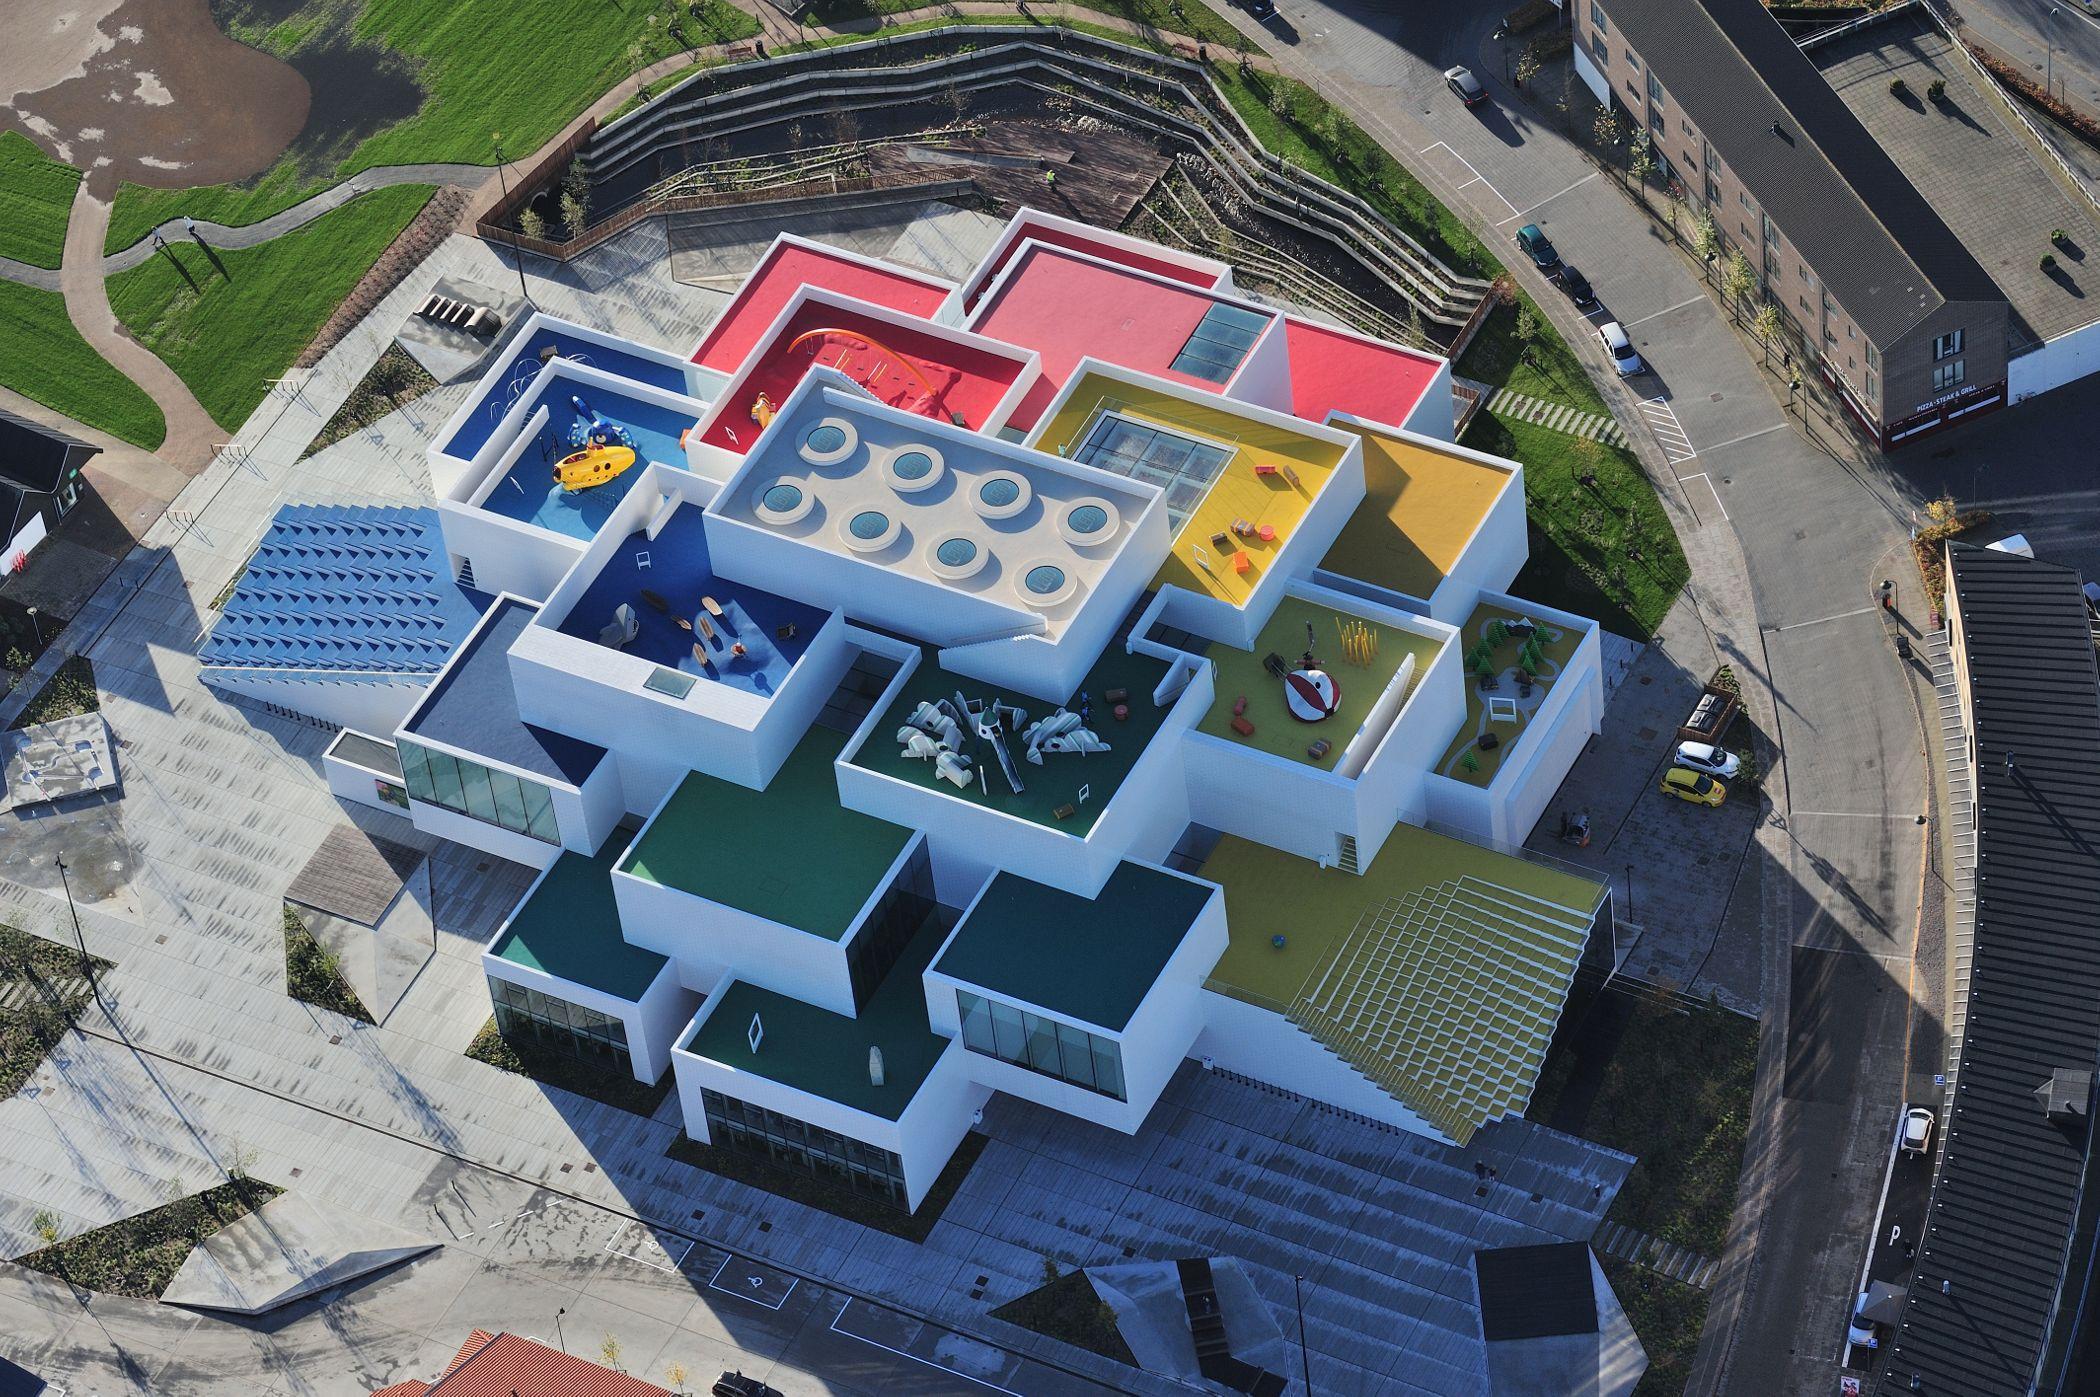 TOP 01_LEGO_HOUSE_2018_Drone.JPG